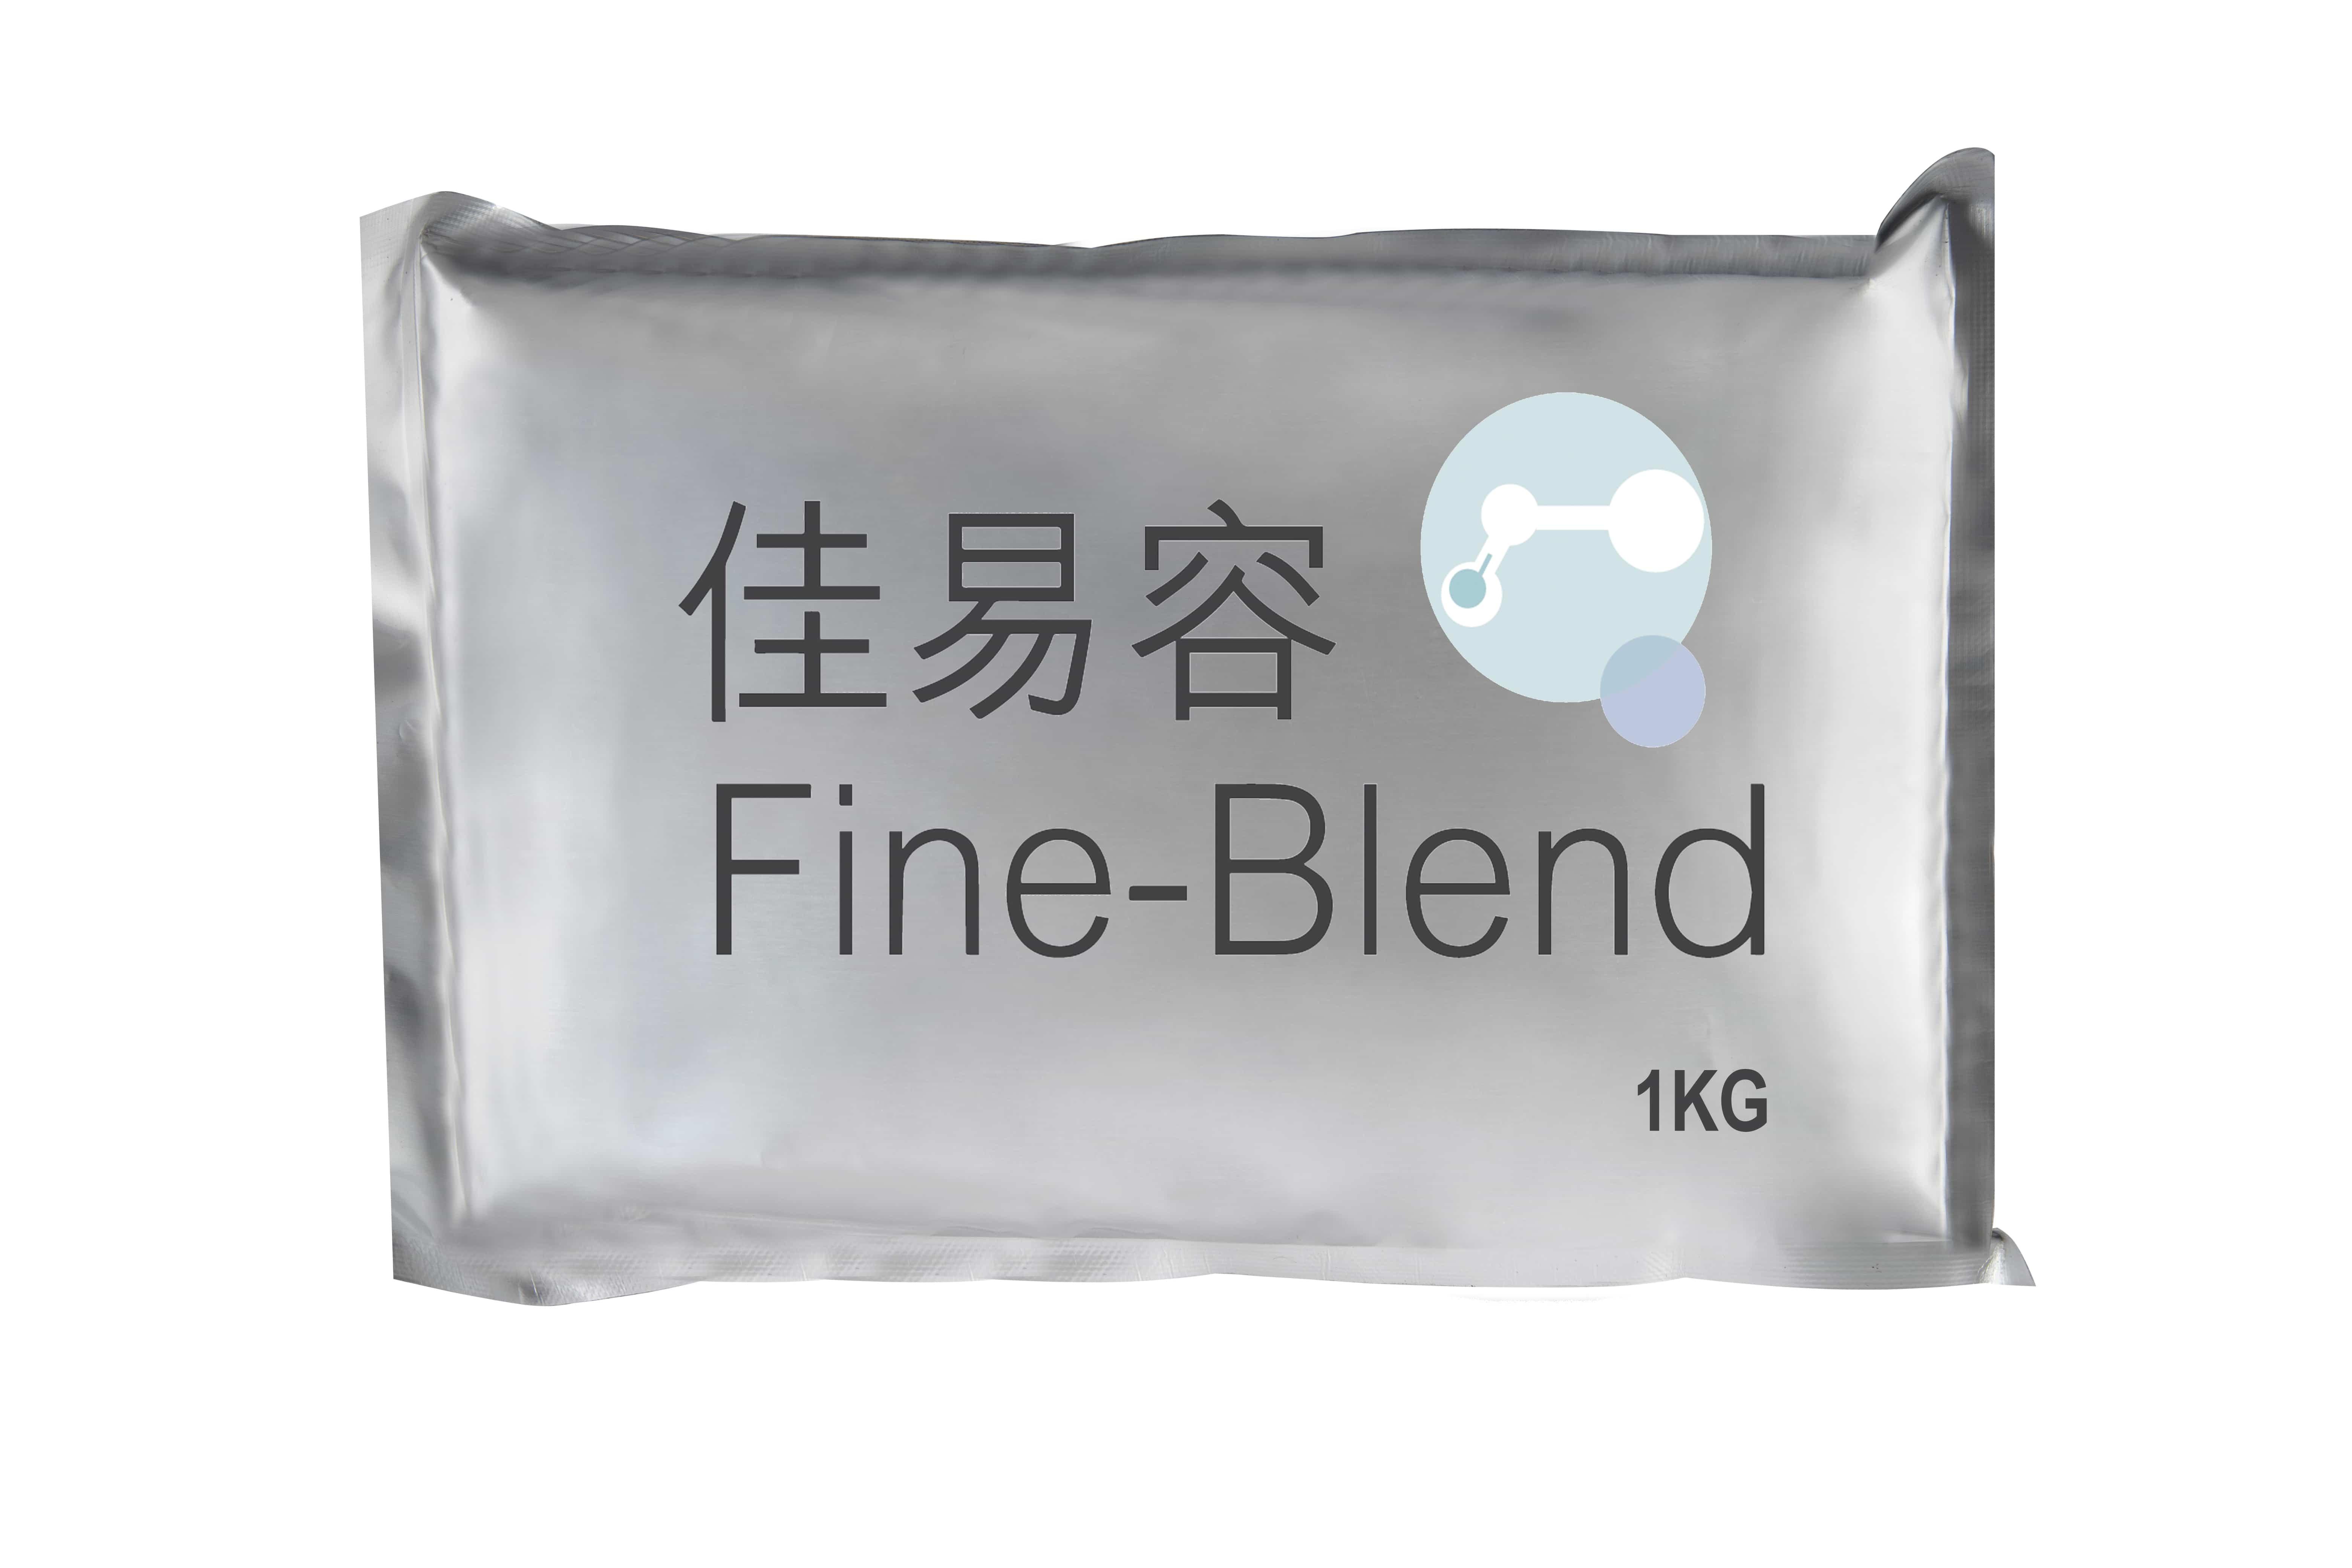 Fine Blend EMI 200  1 kg (2.2 lb)